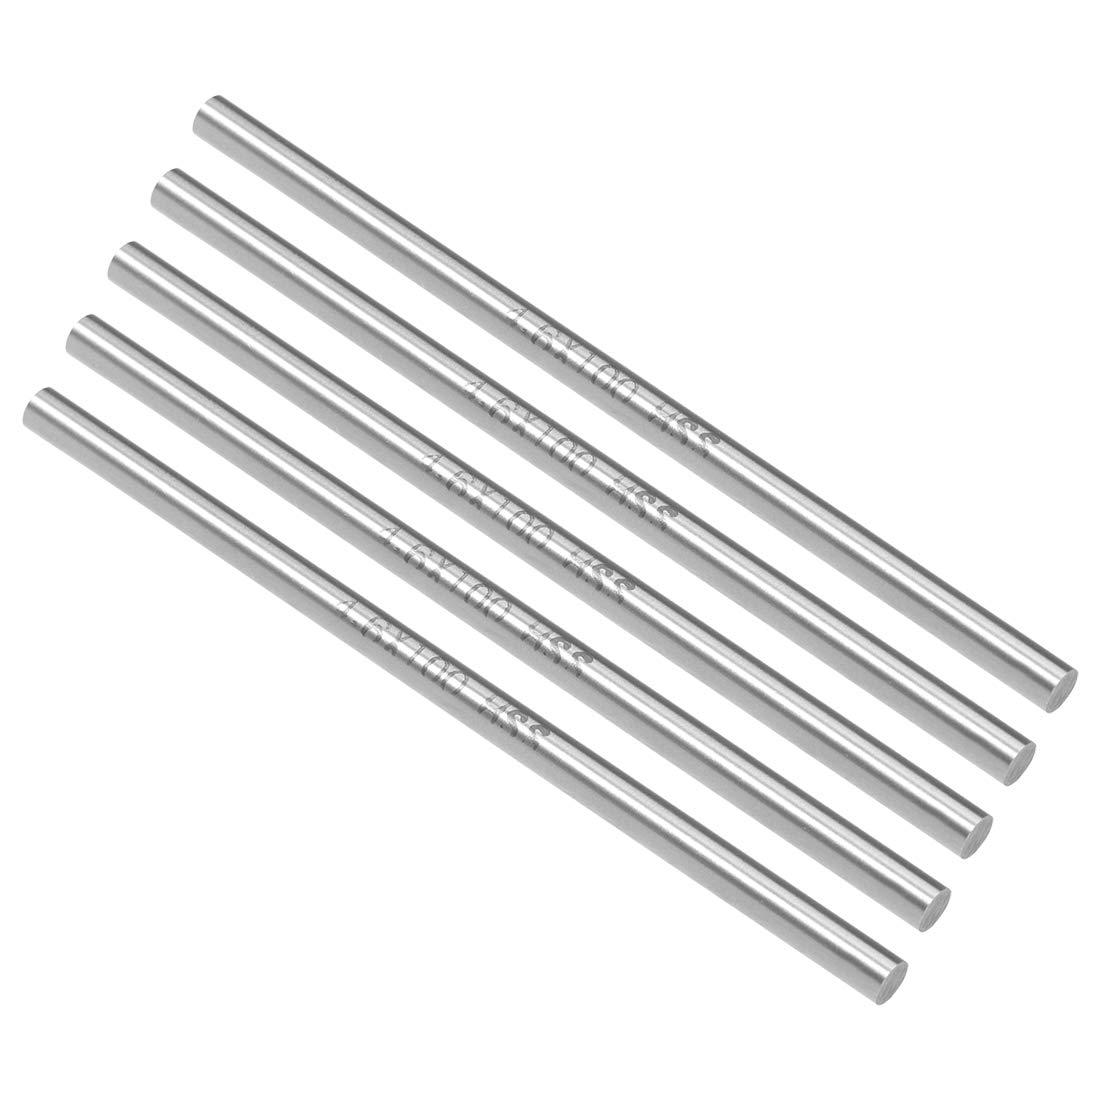 uxcell HSS Lathe Round Rod Solid Shaft Bar 3.9mm Dia 100mm Length 10Pcs